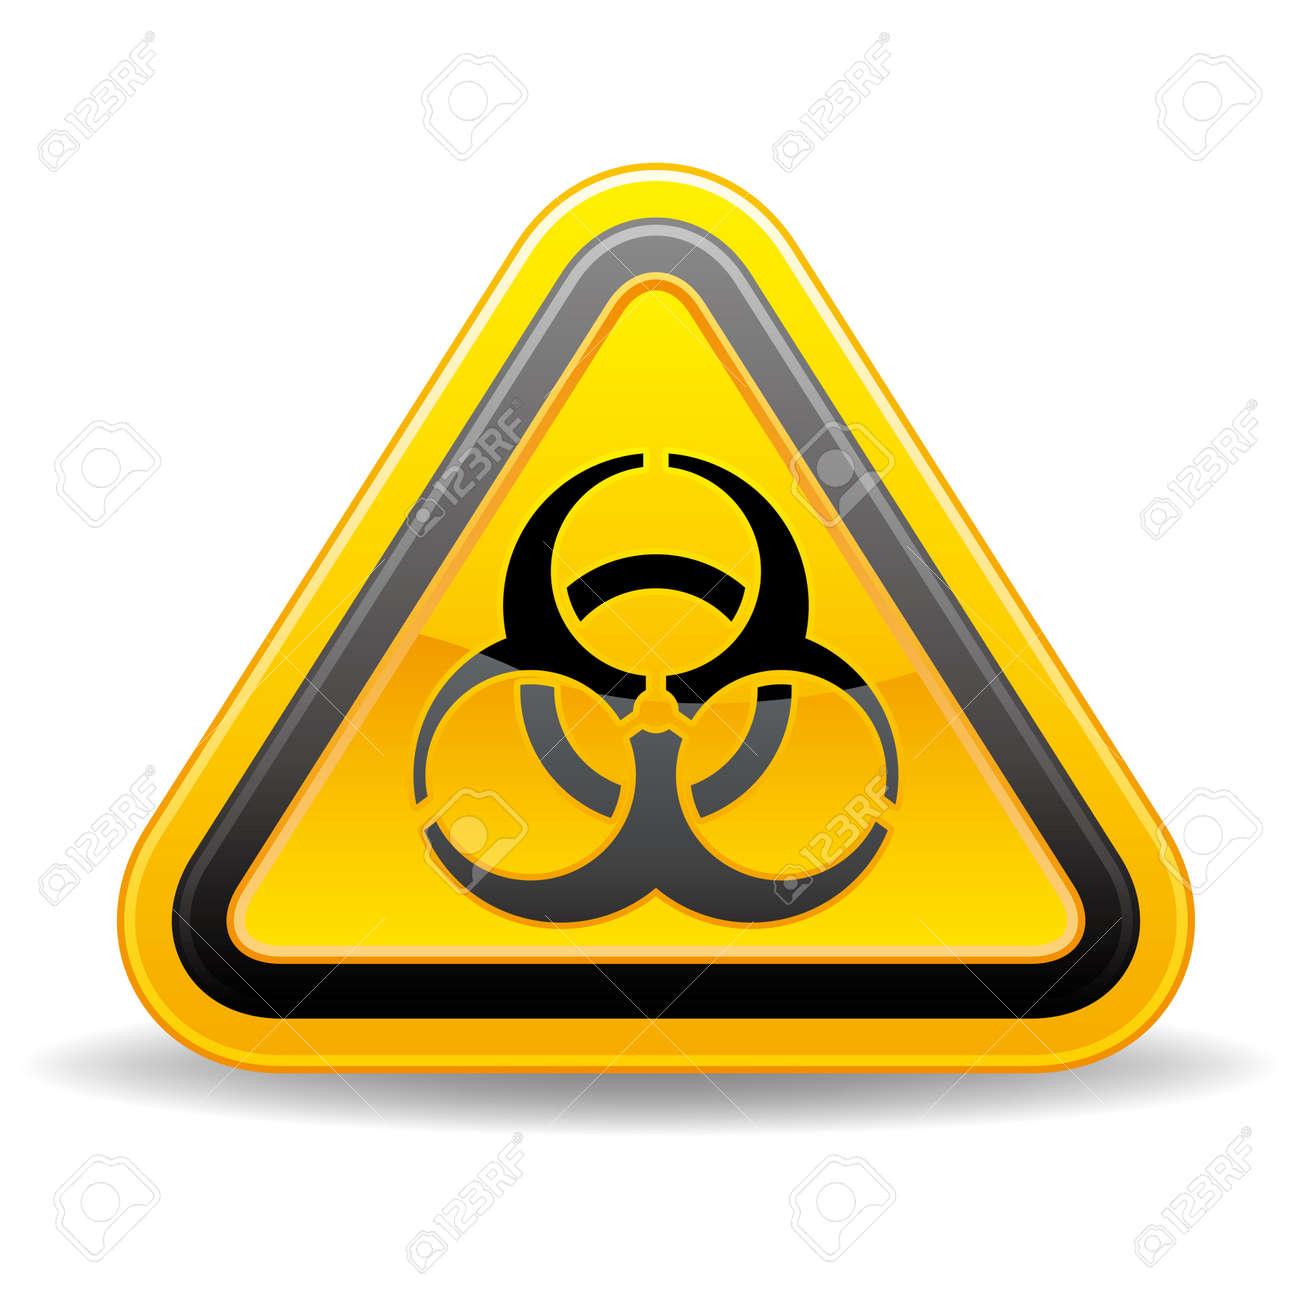 yellow triangular biohazard warning sign Stock Vector - 9126521